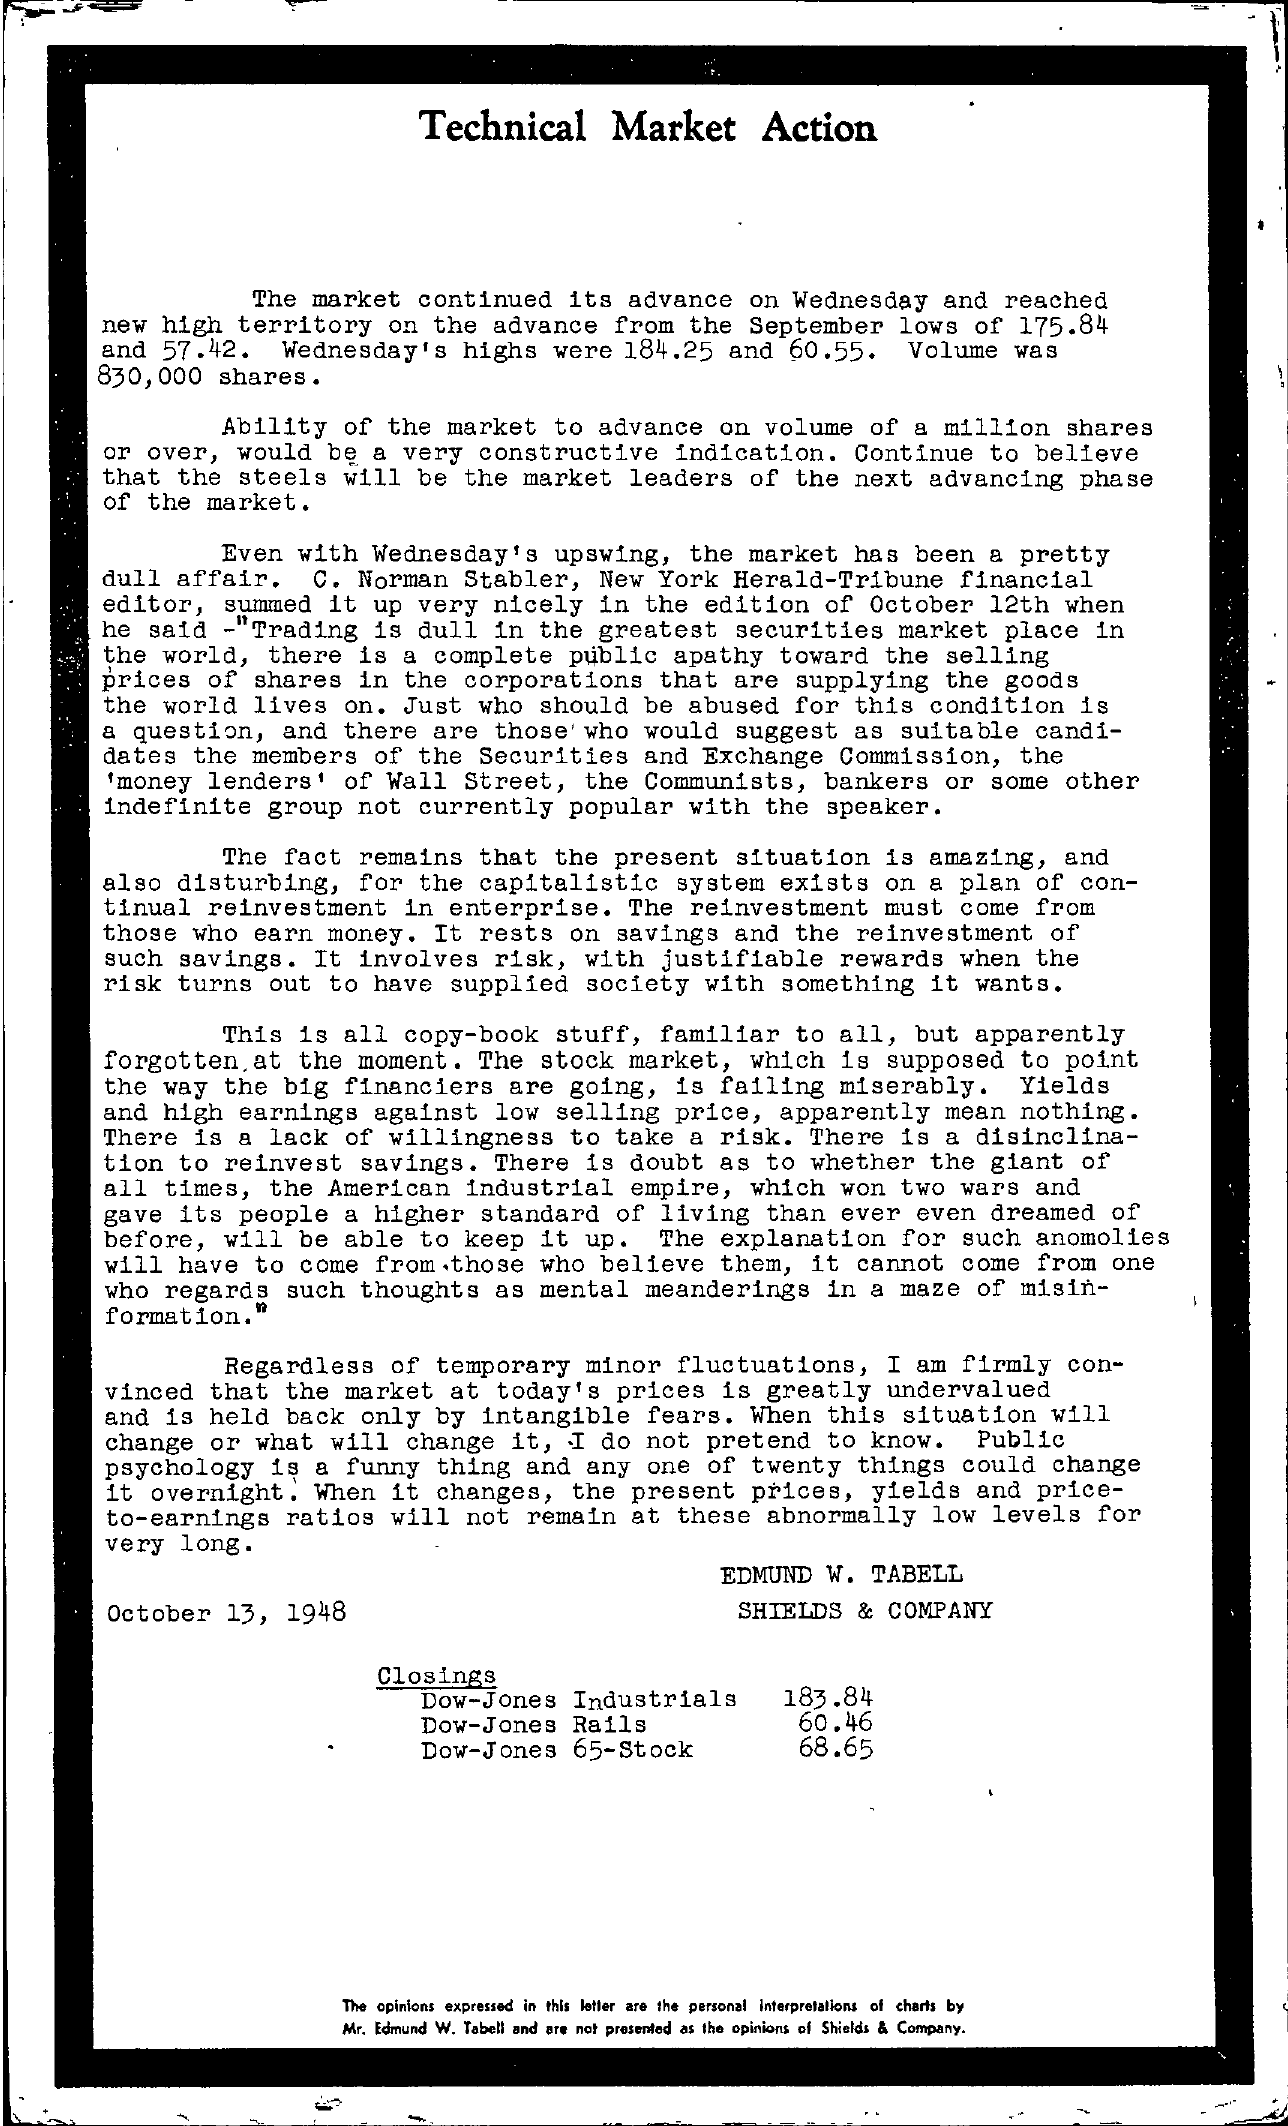 Tabell's Market Letter - October 13, 1948